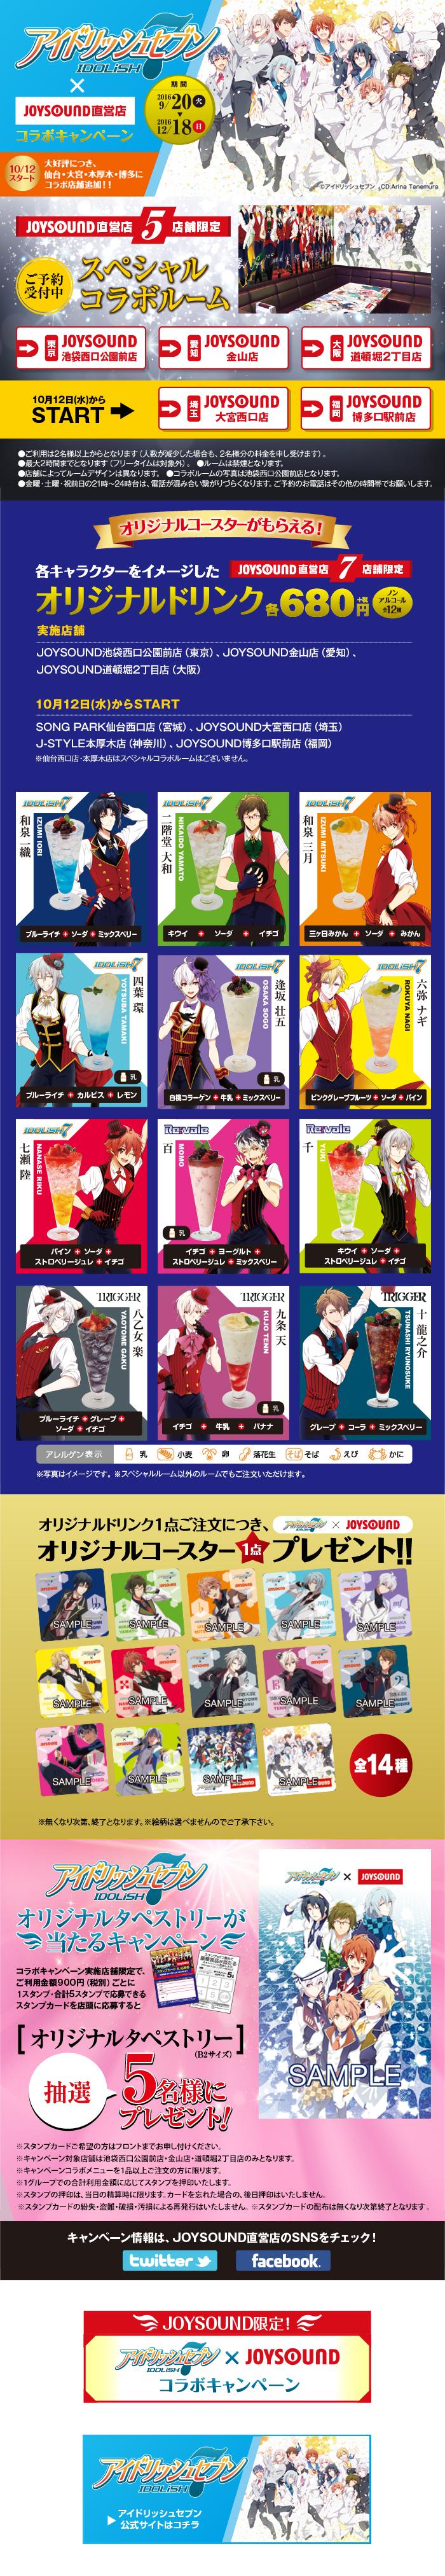 【アイナナ×JOYSOUND】JOYSOUND直営店新たに「大宮西口店・博多口駅前店」2店舗追加!